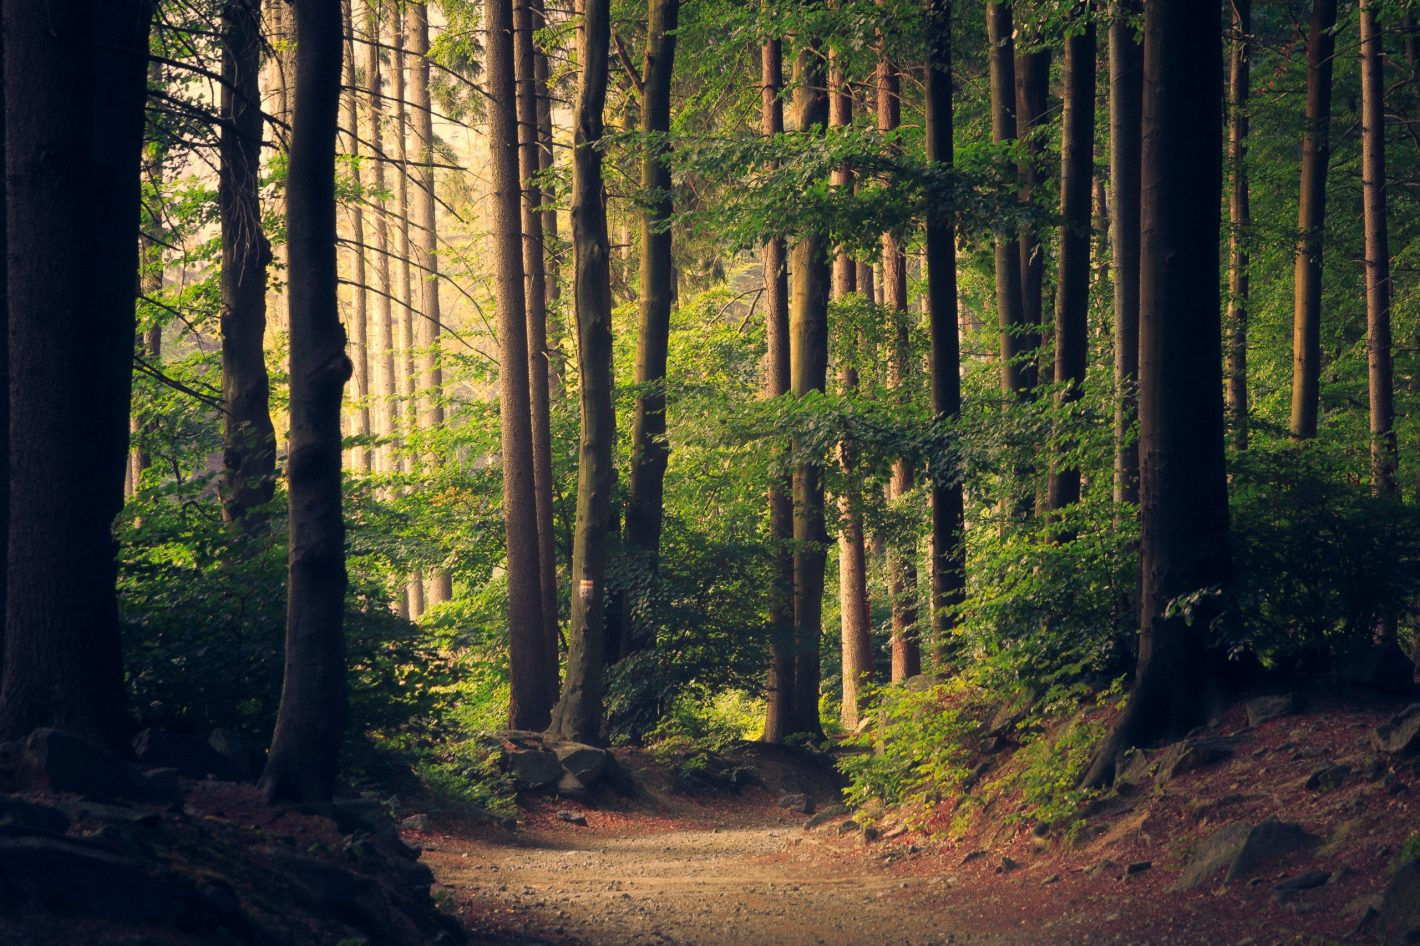 Sådan kan du nemt støtte regnskoven